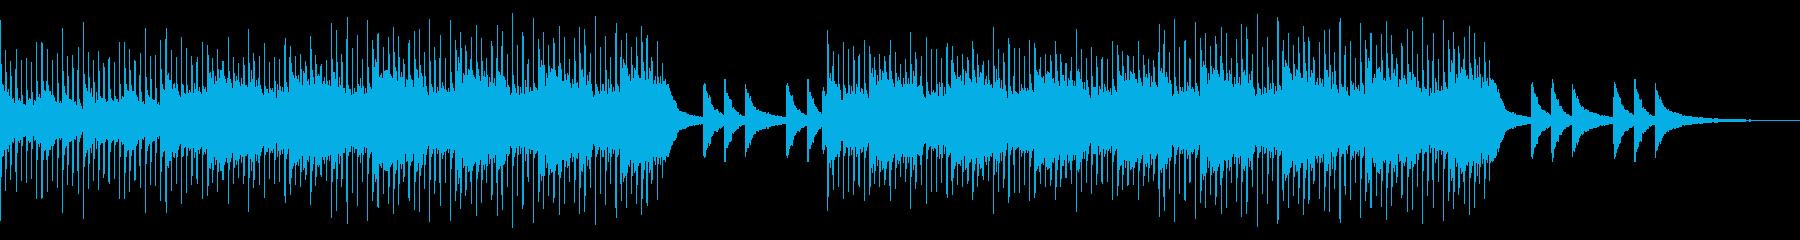 No melody Cool guitar violin's reproduced waveform